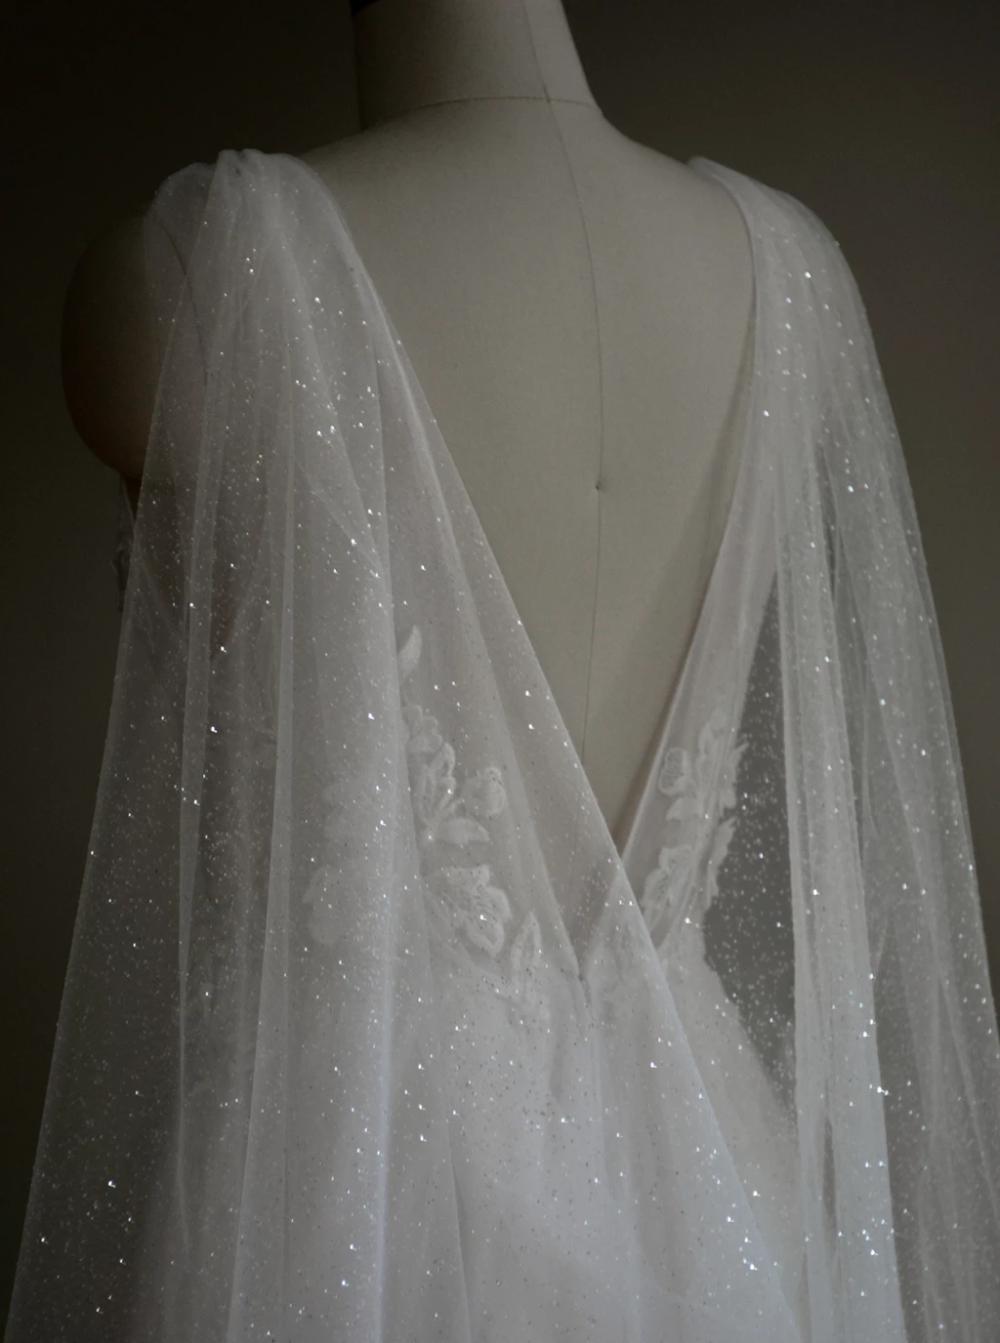 Vega Sparkling Bridal Cape Sparkle Wedding Dress Bridal Cape Cape Wedding Dress